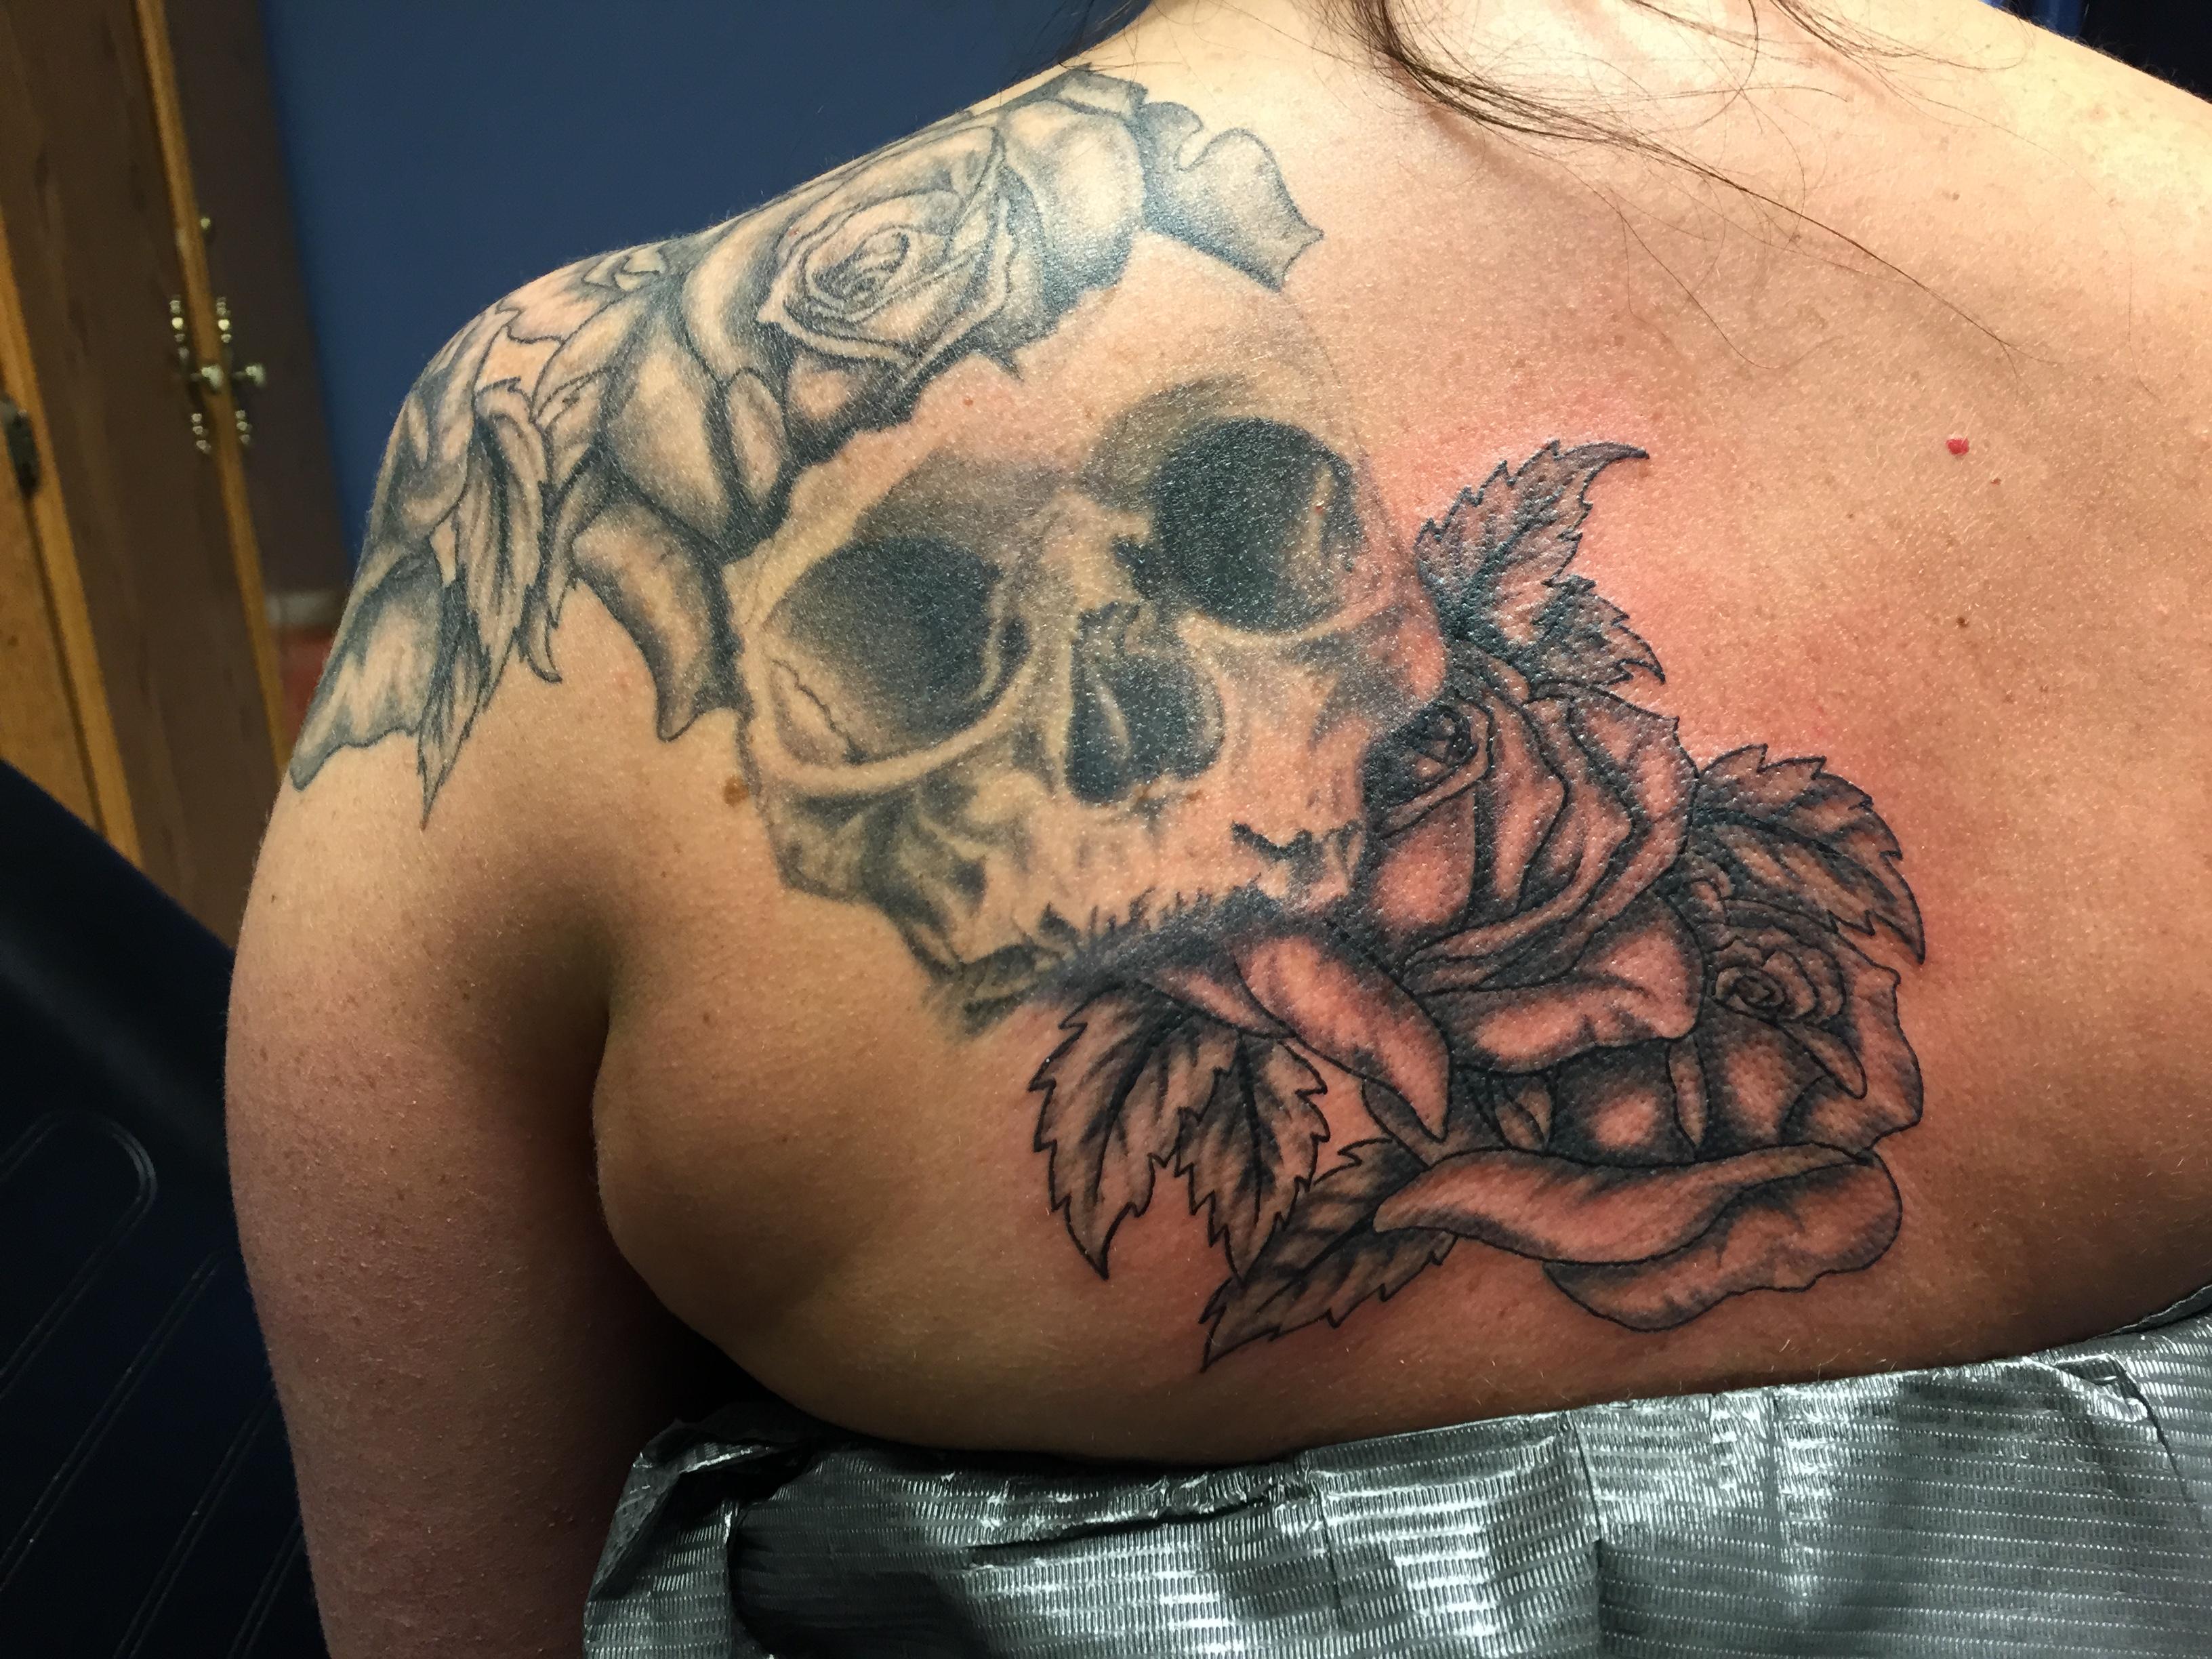 Gray shaded skull and roses